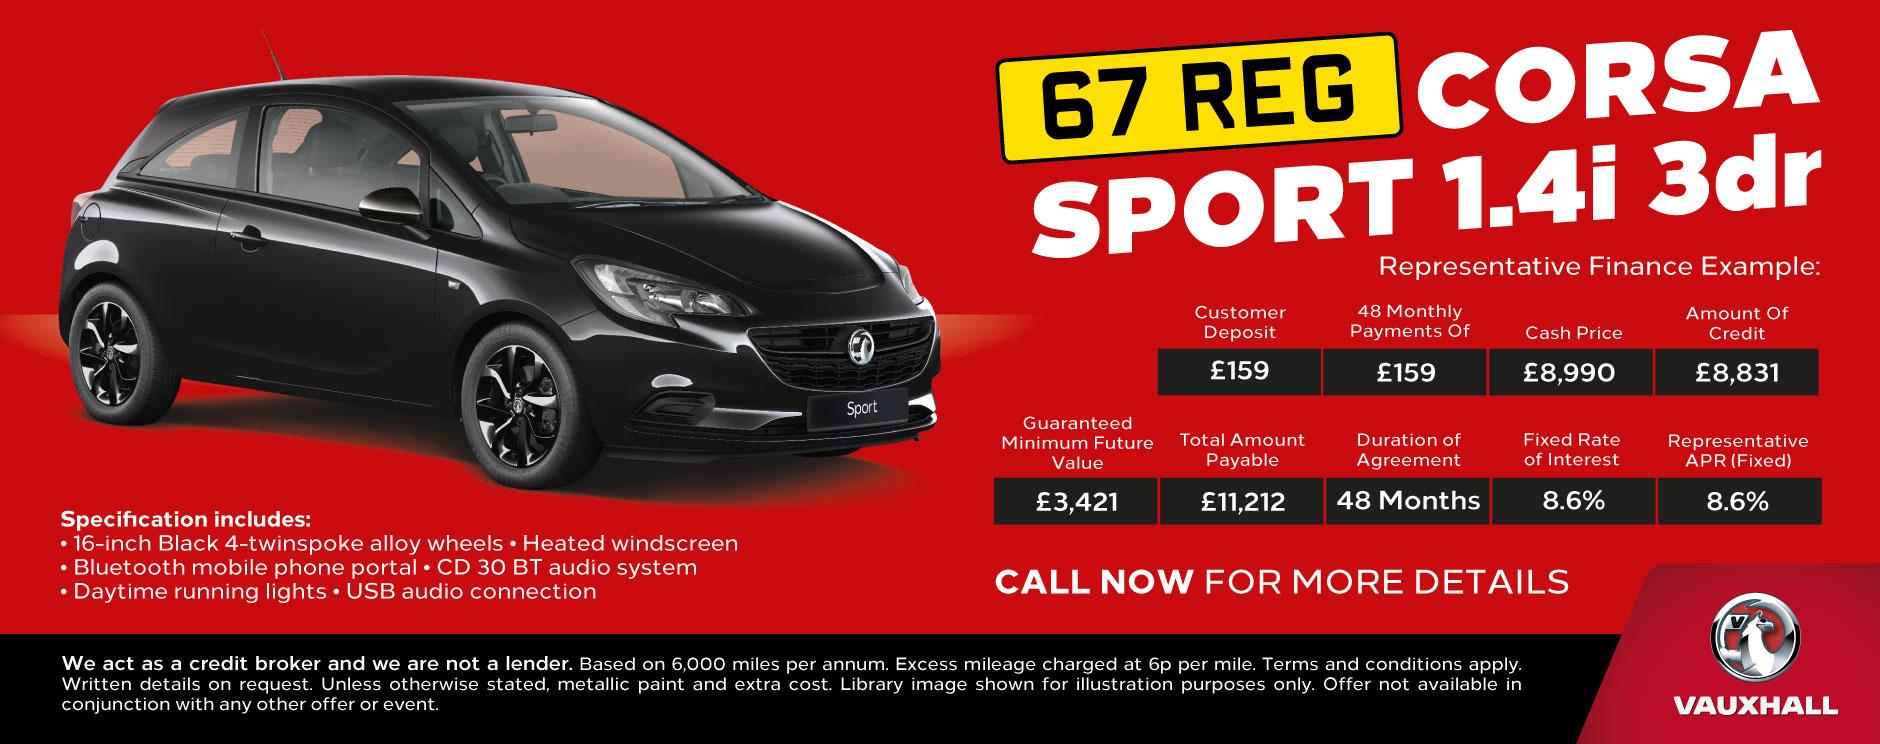 Vauxhall Corsa Deals New Vauxhall Corsa Cars For Sale